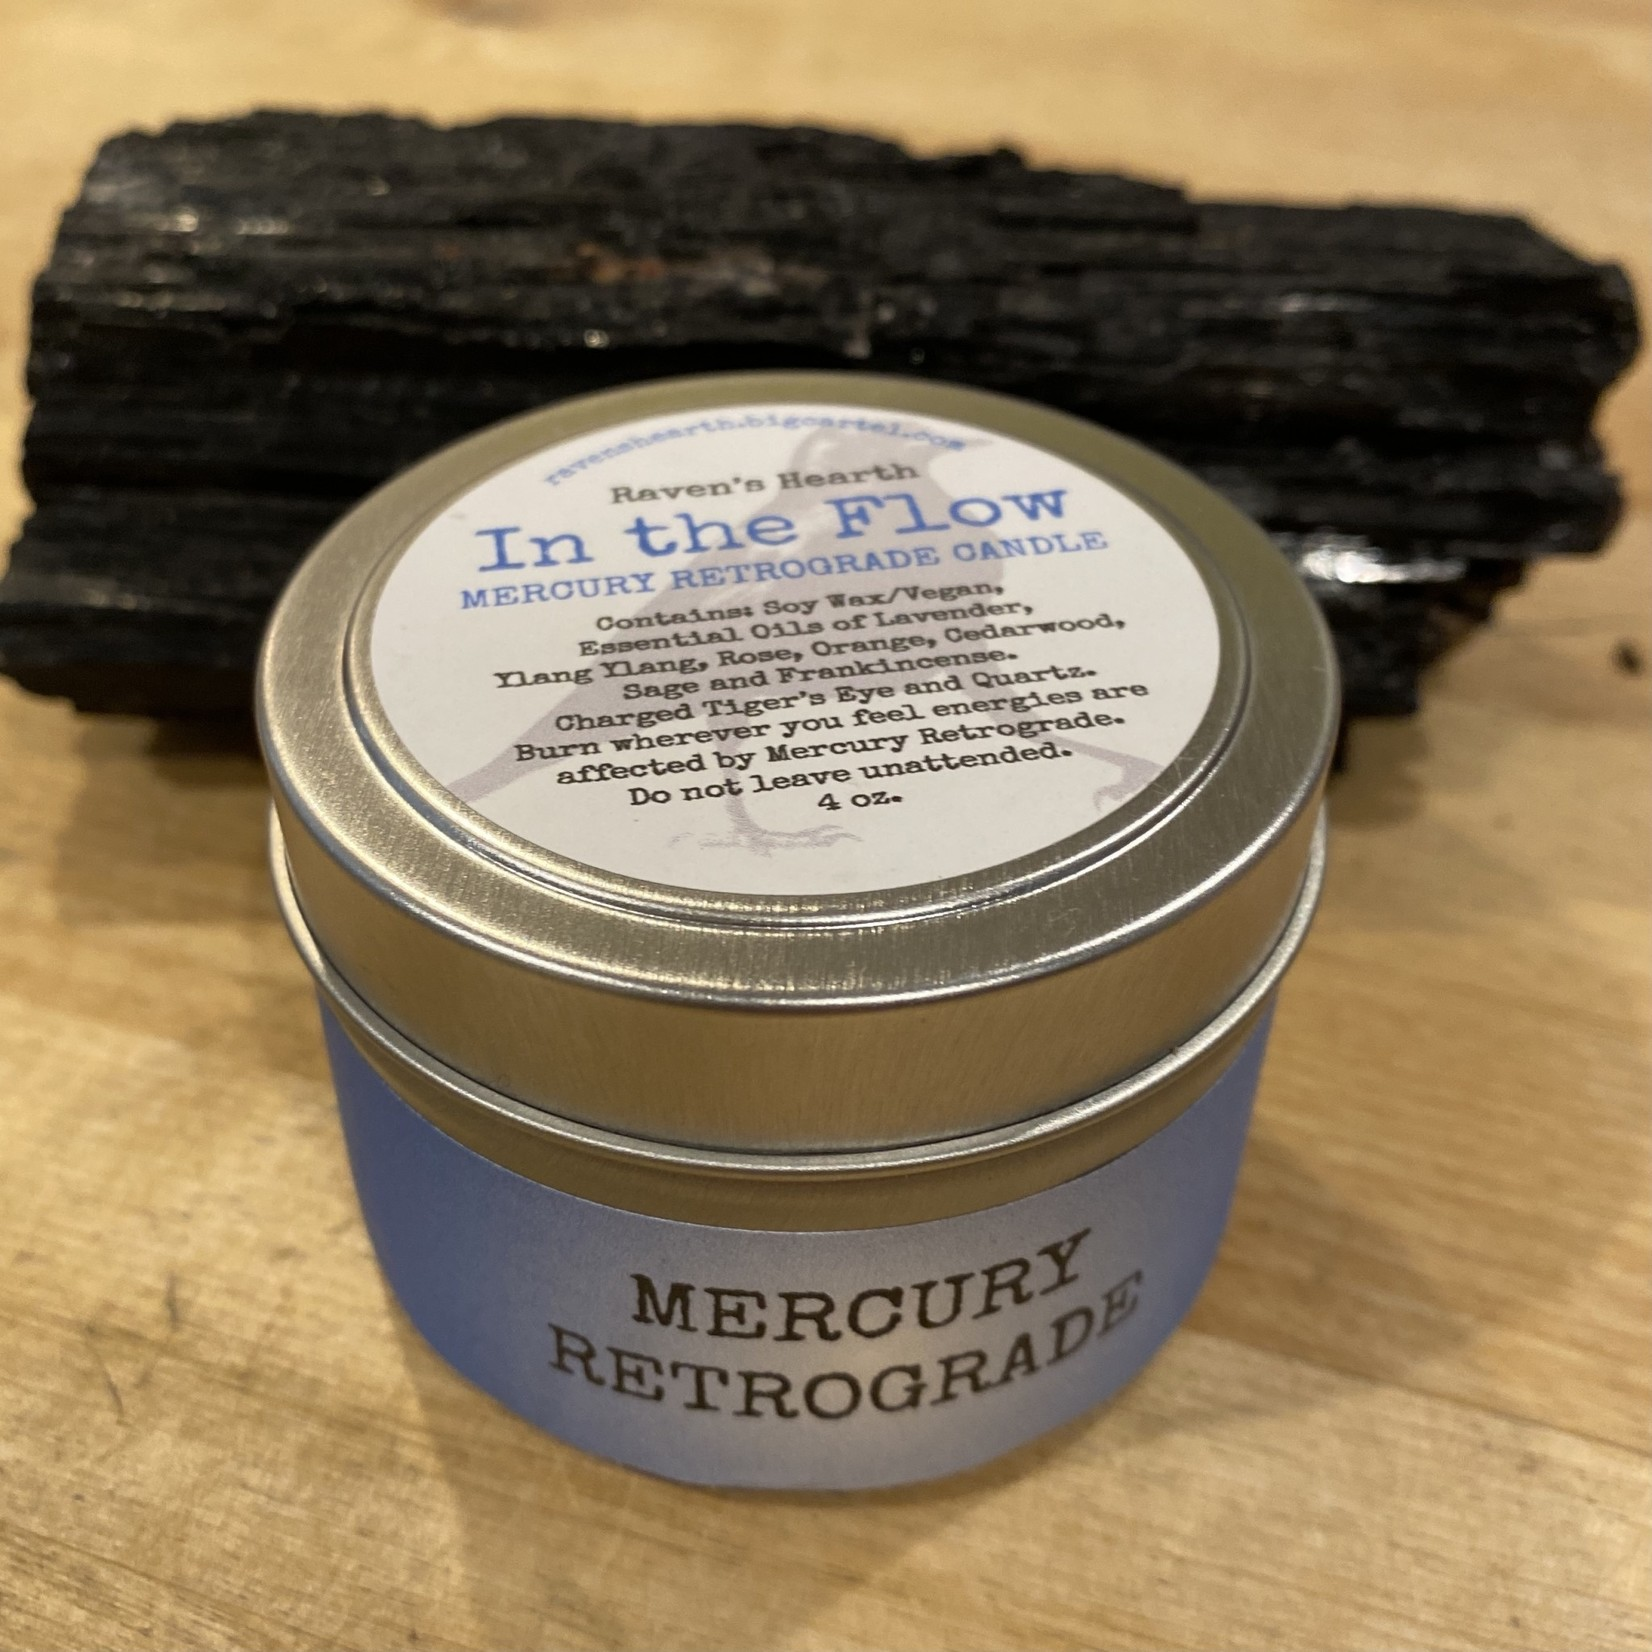 Mercury Retrograde Candle